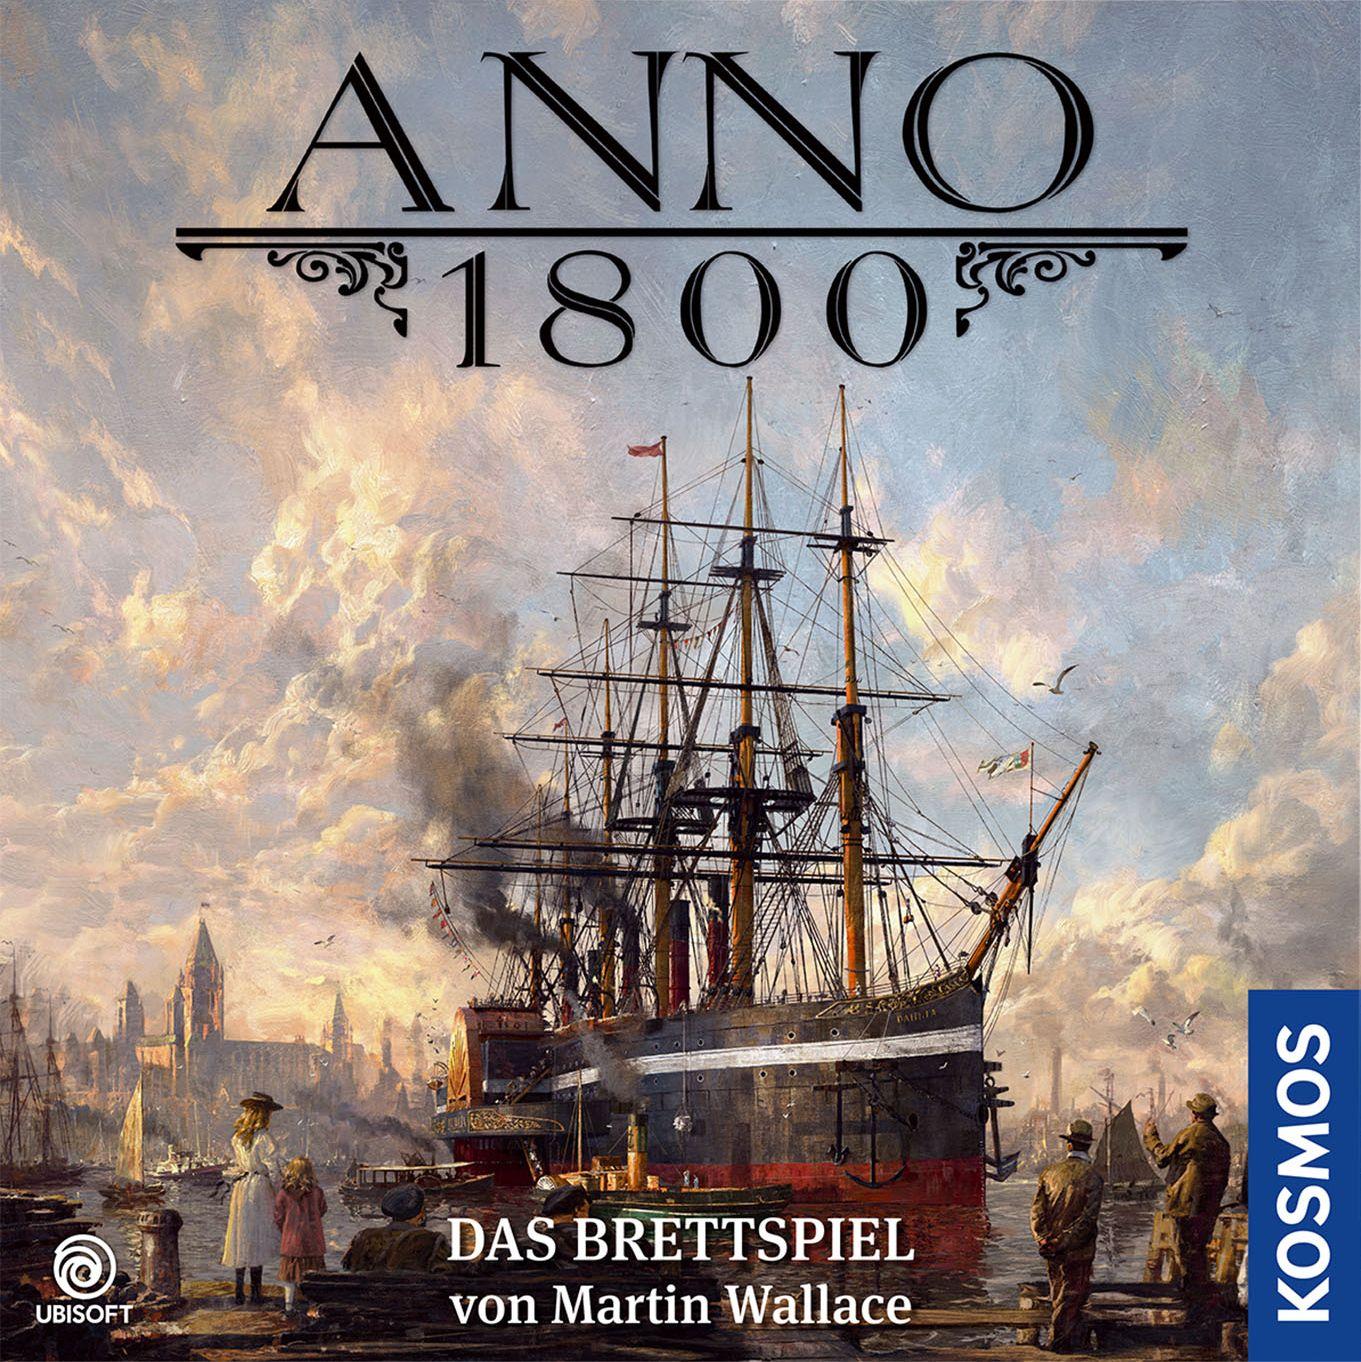 настольная игра Anno 1800